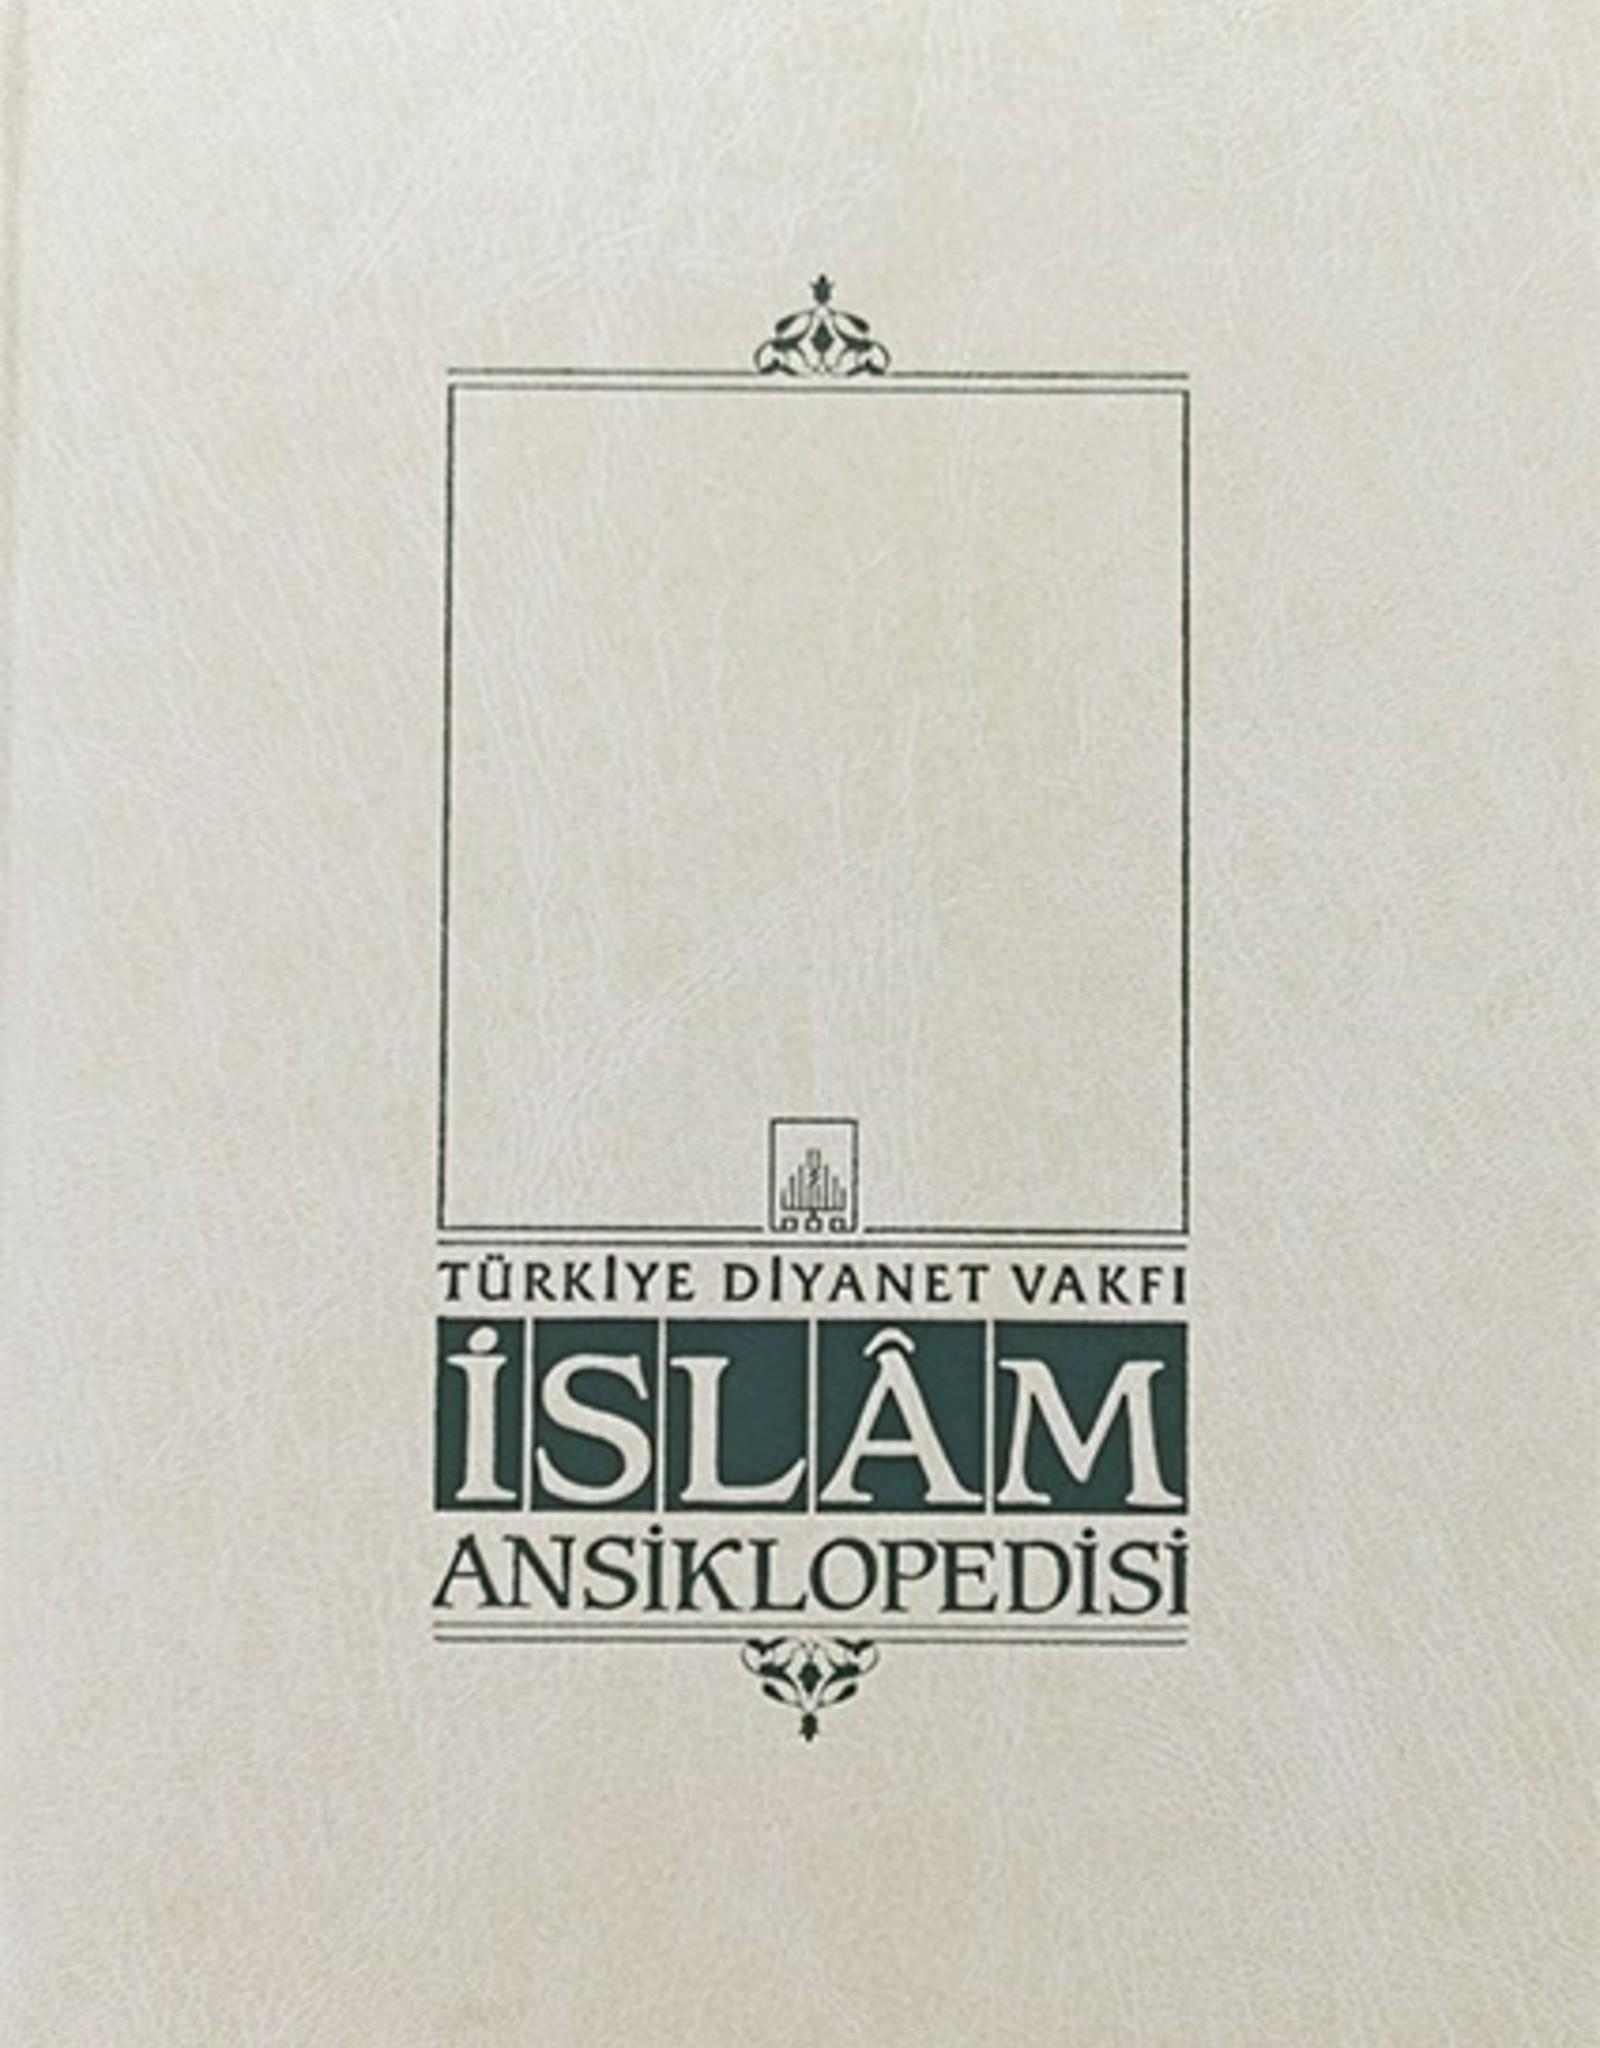 İslam Ansiklopedisi 16. Cilt